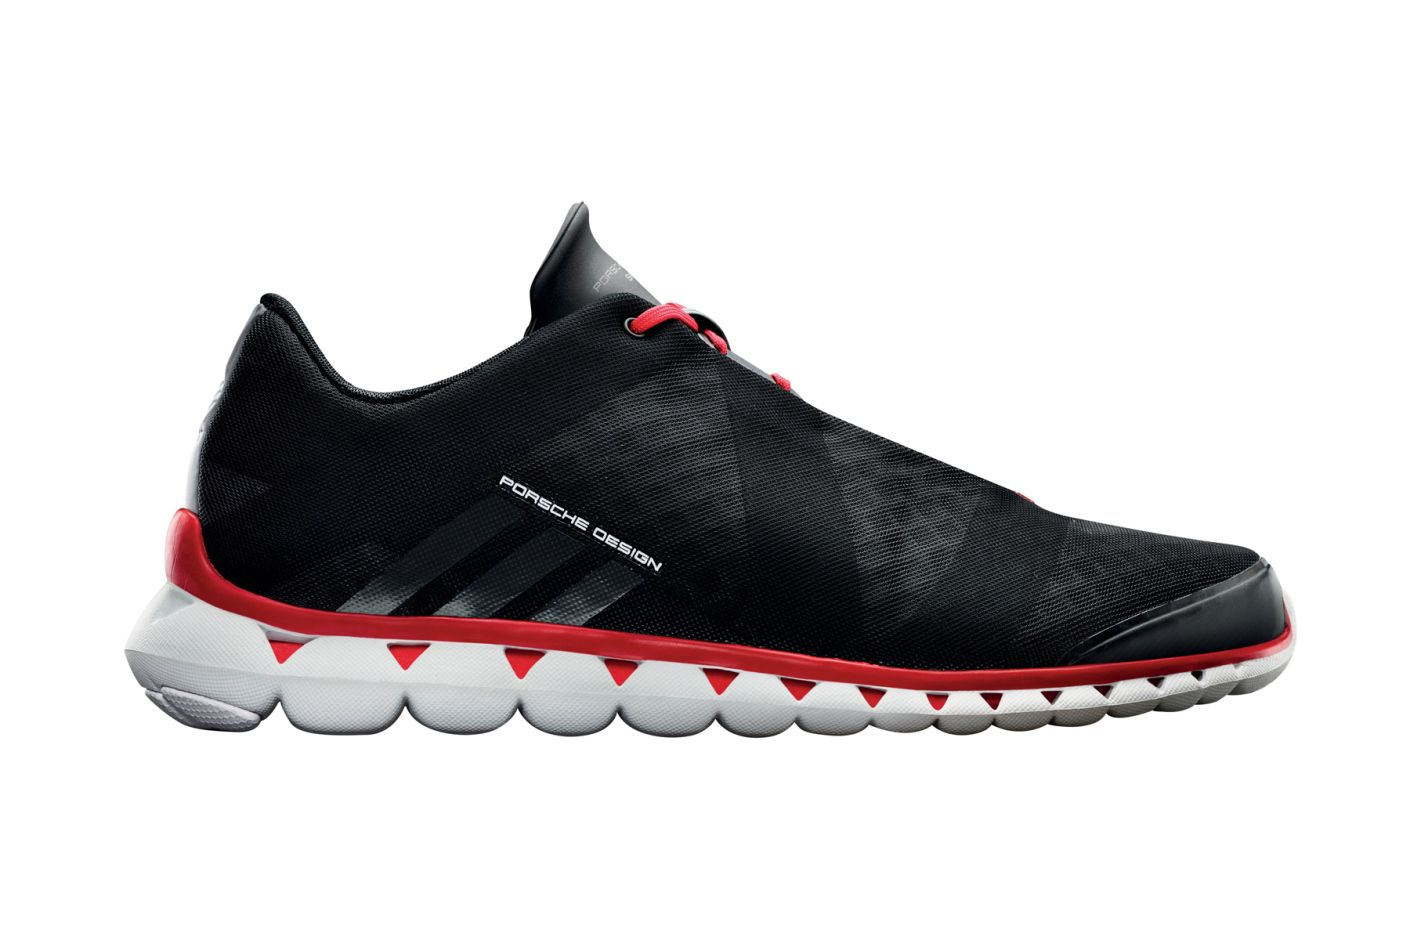 Porsche Design Sport by adidas Gym Easy Trainer II | Shoes